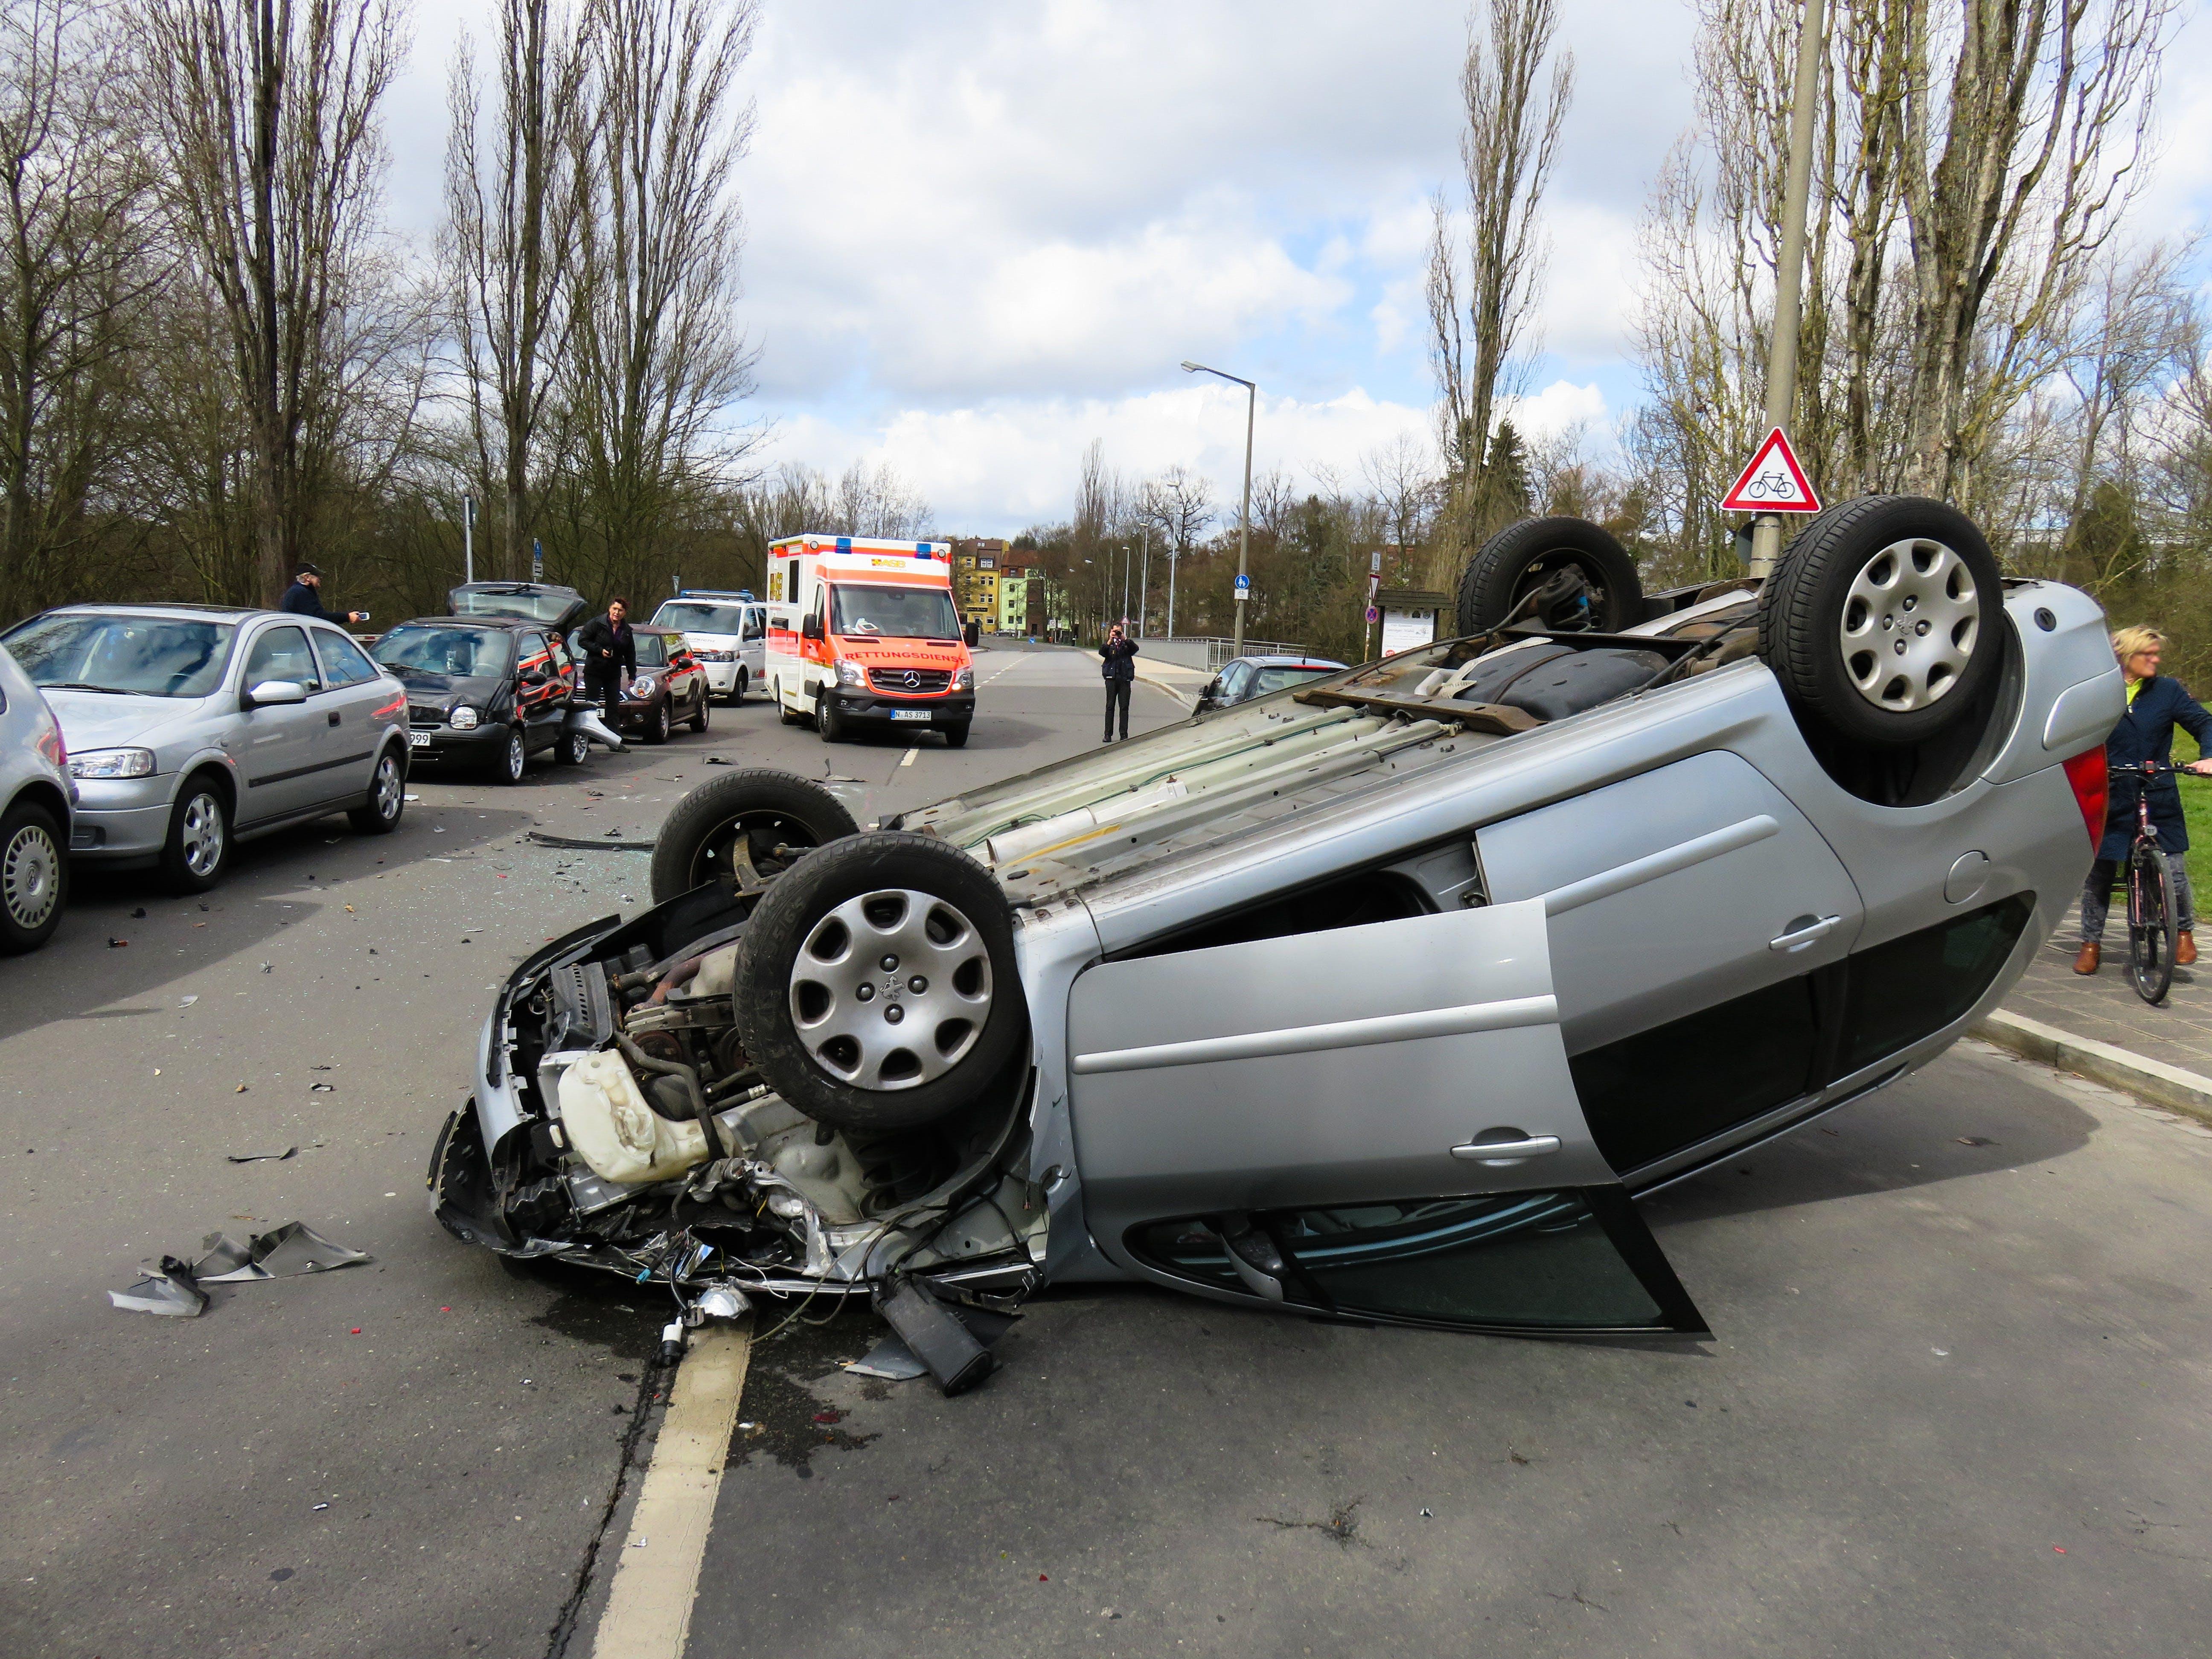 Free stock photo of broken, vehicle, police, emergency